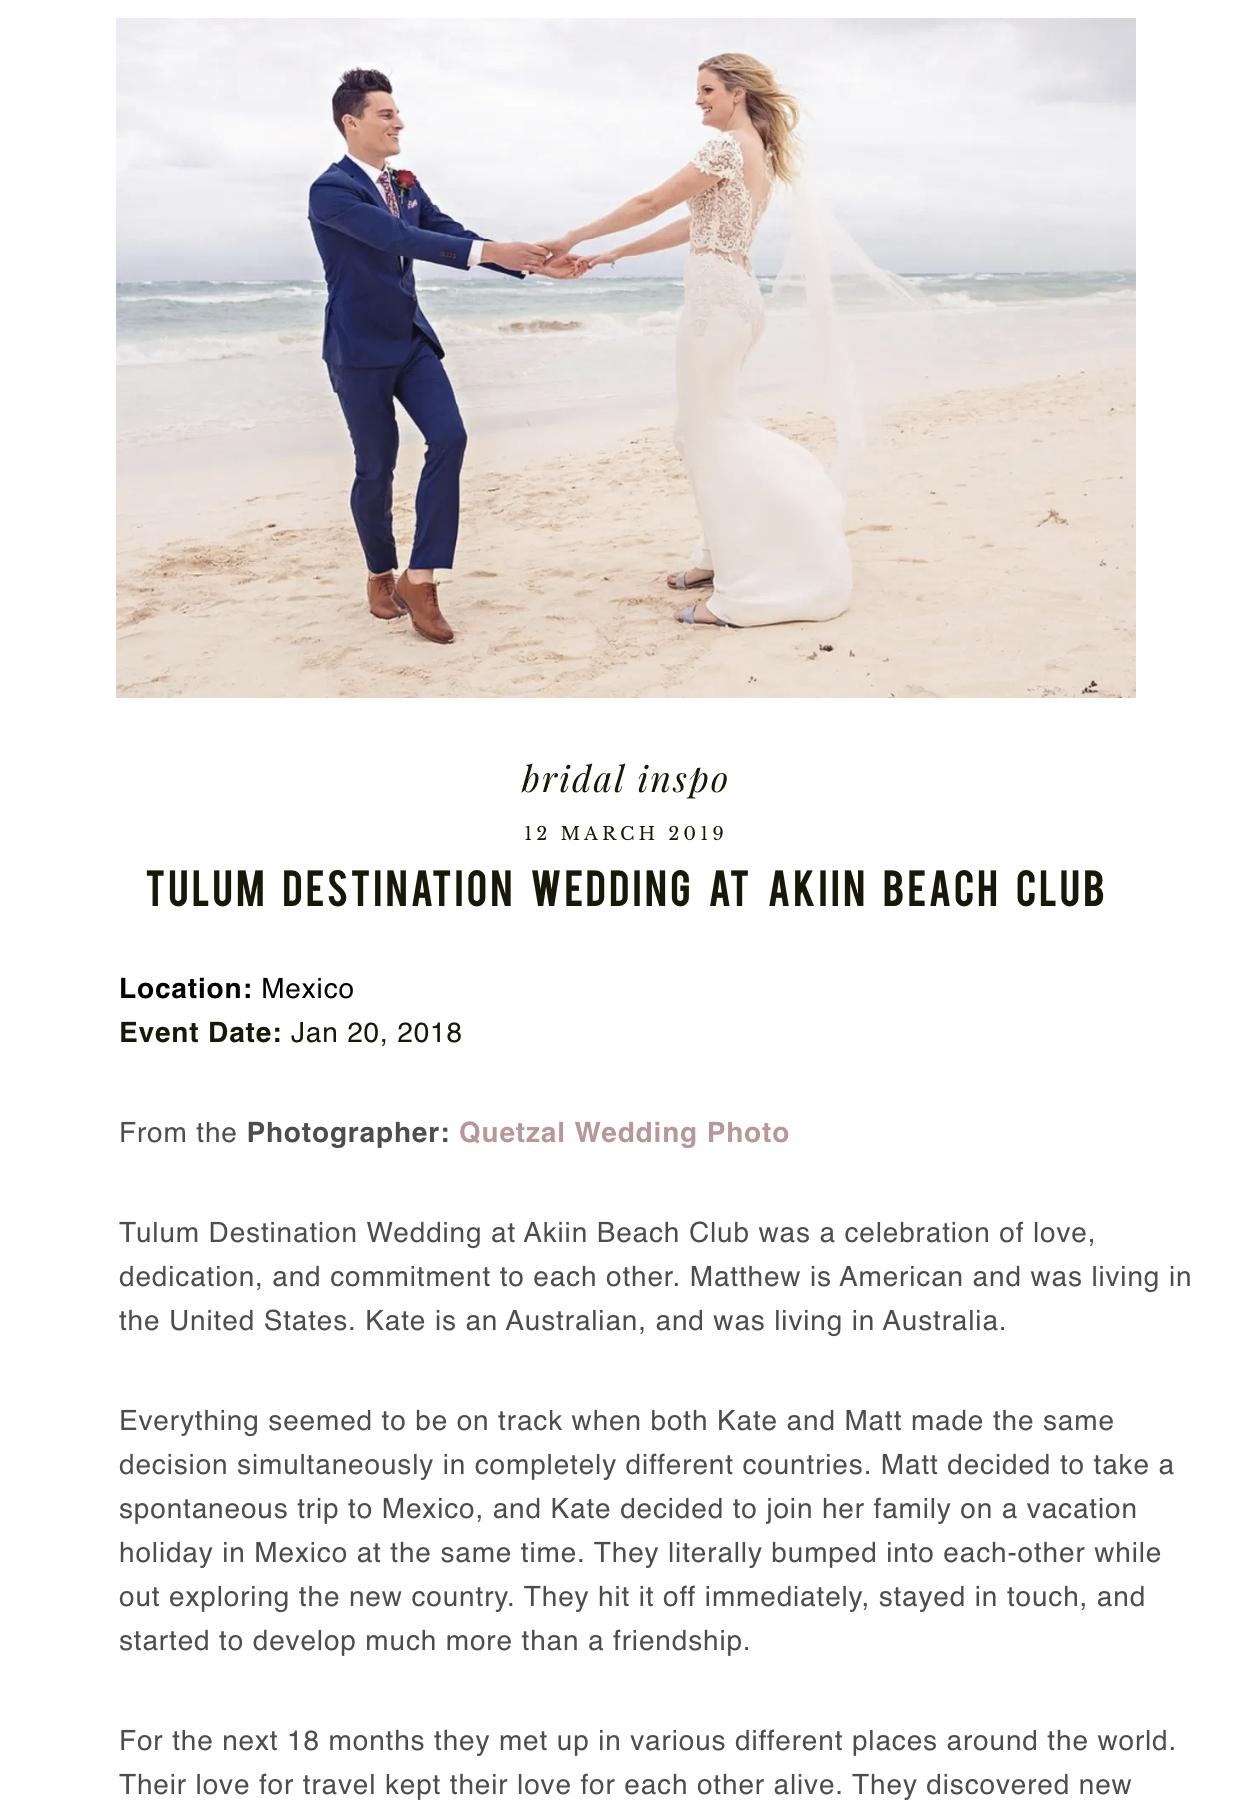 TULUM DESTINATION WEDDING AT AKIIN BEACH CLUB